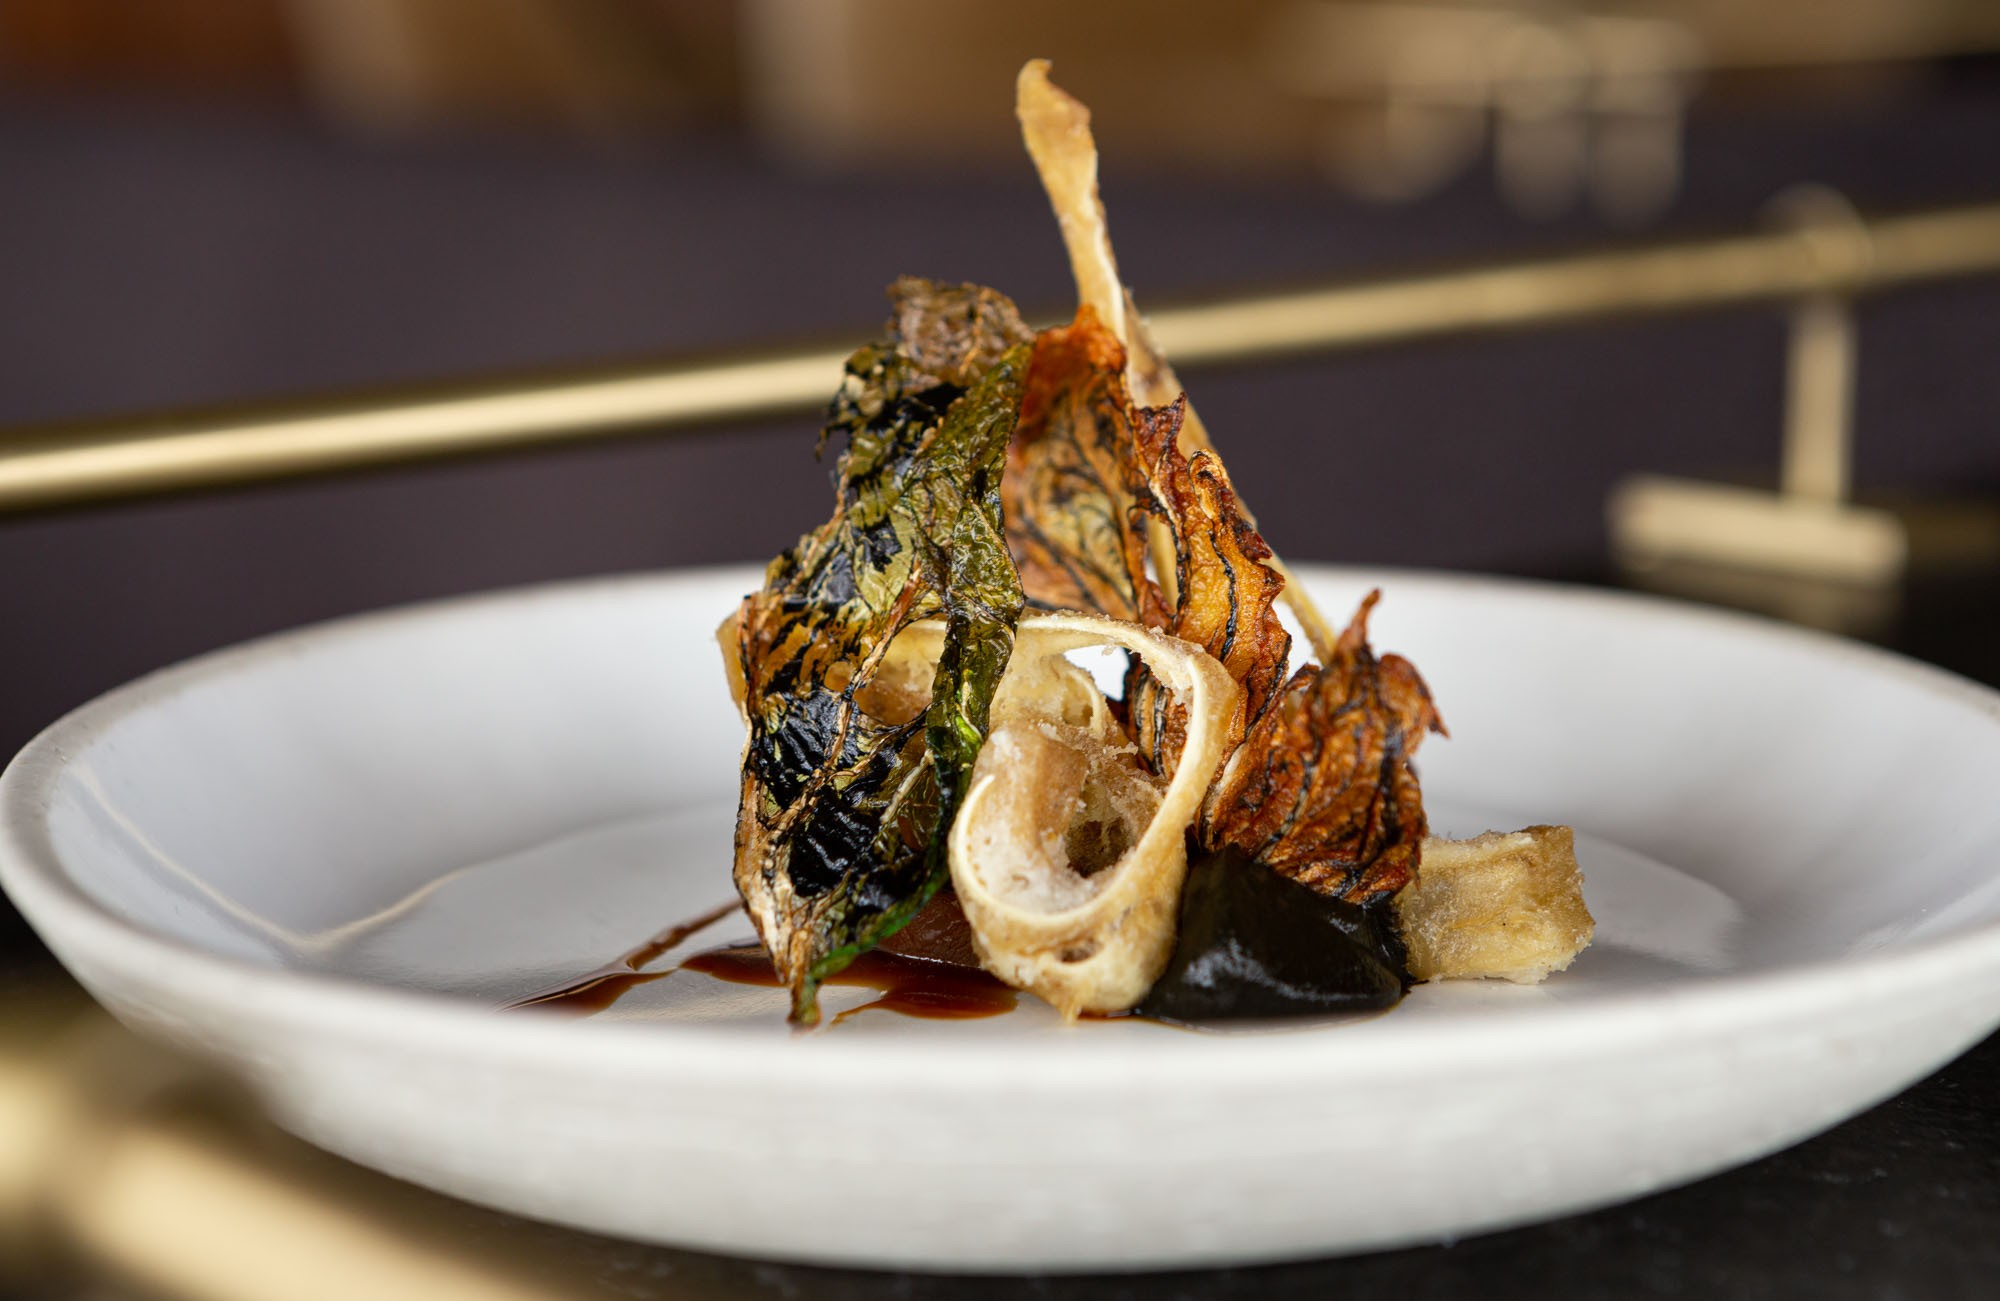 Canoe Restaurant tasting menu dish - nose to tail